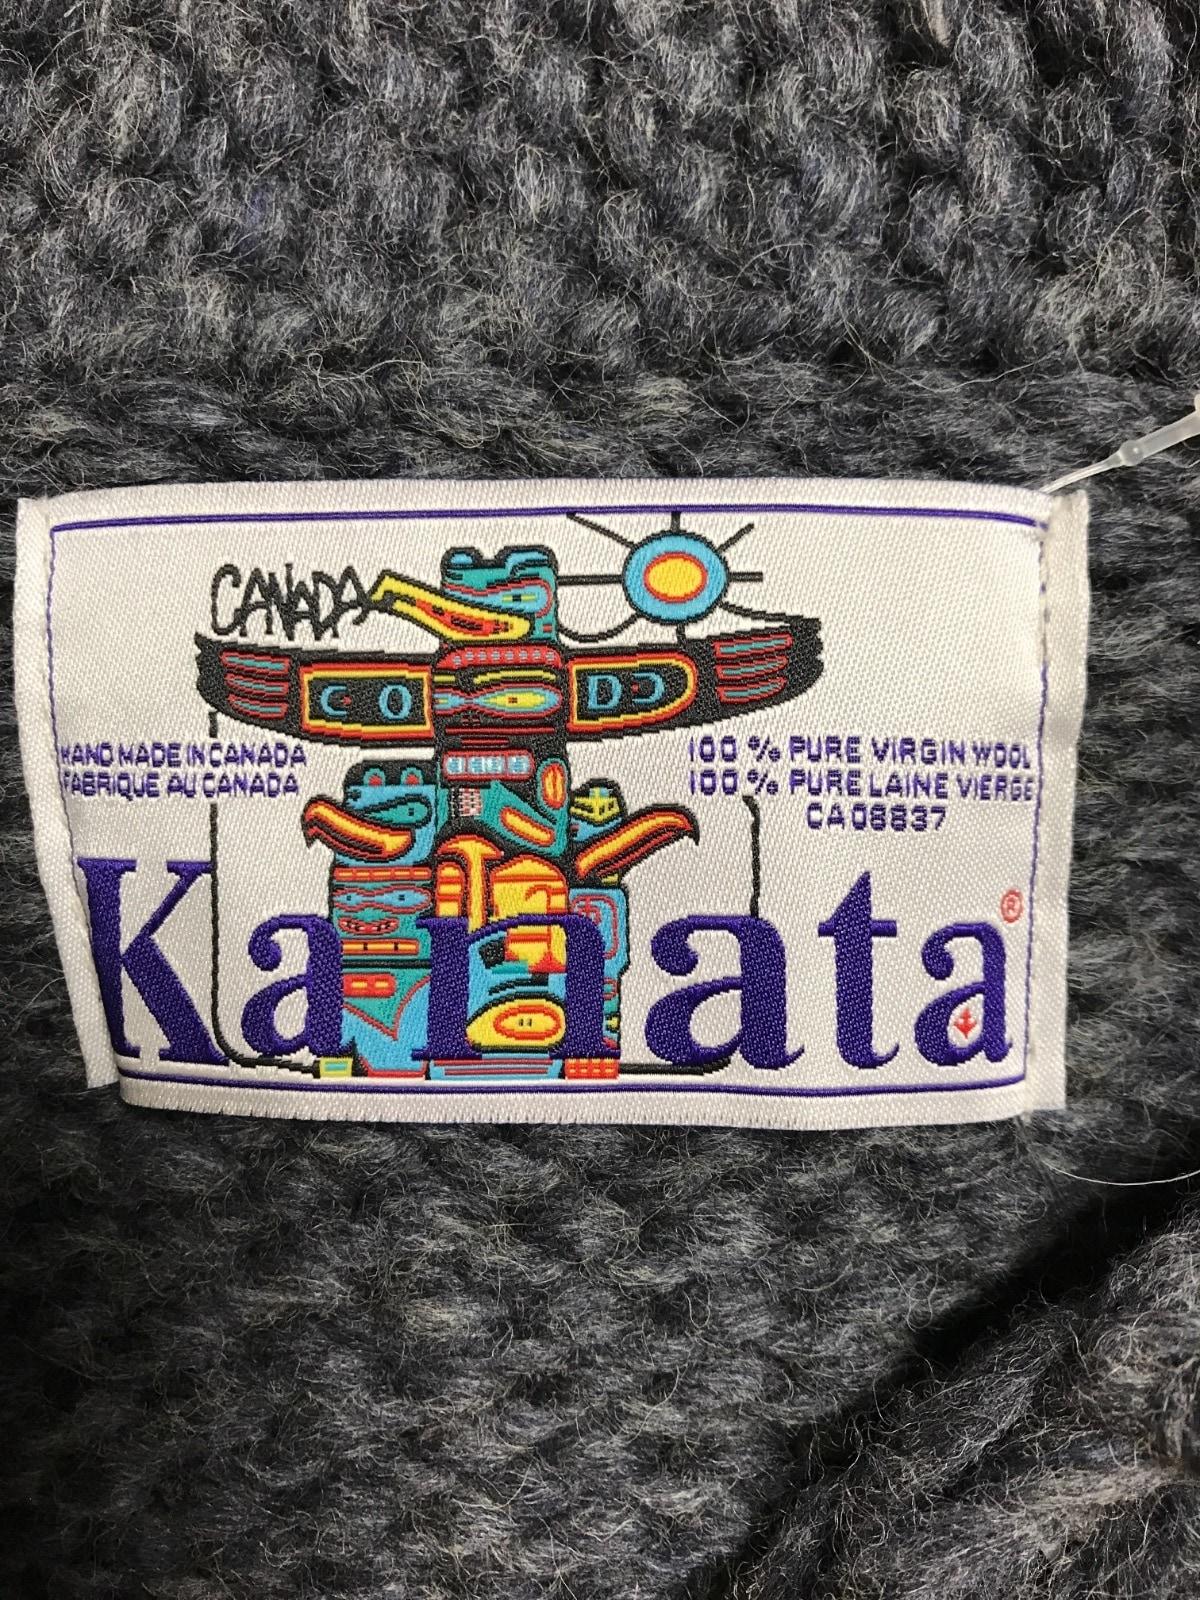 Kanata(カナタ)のカーディガン